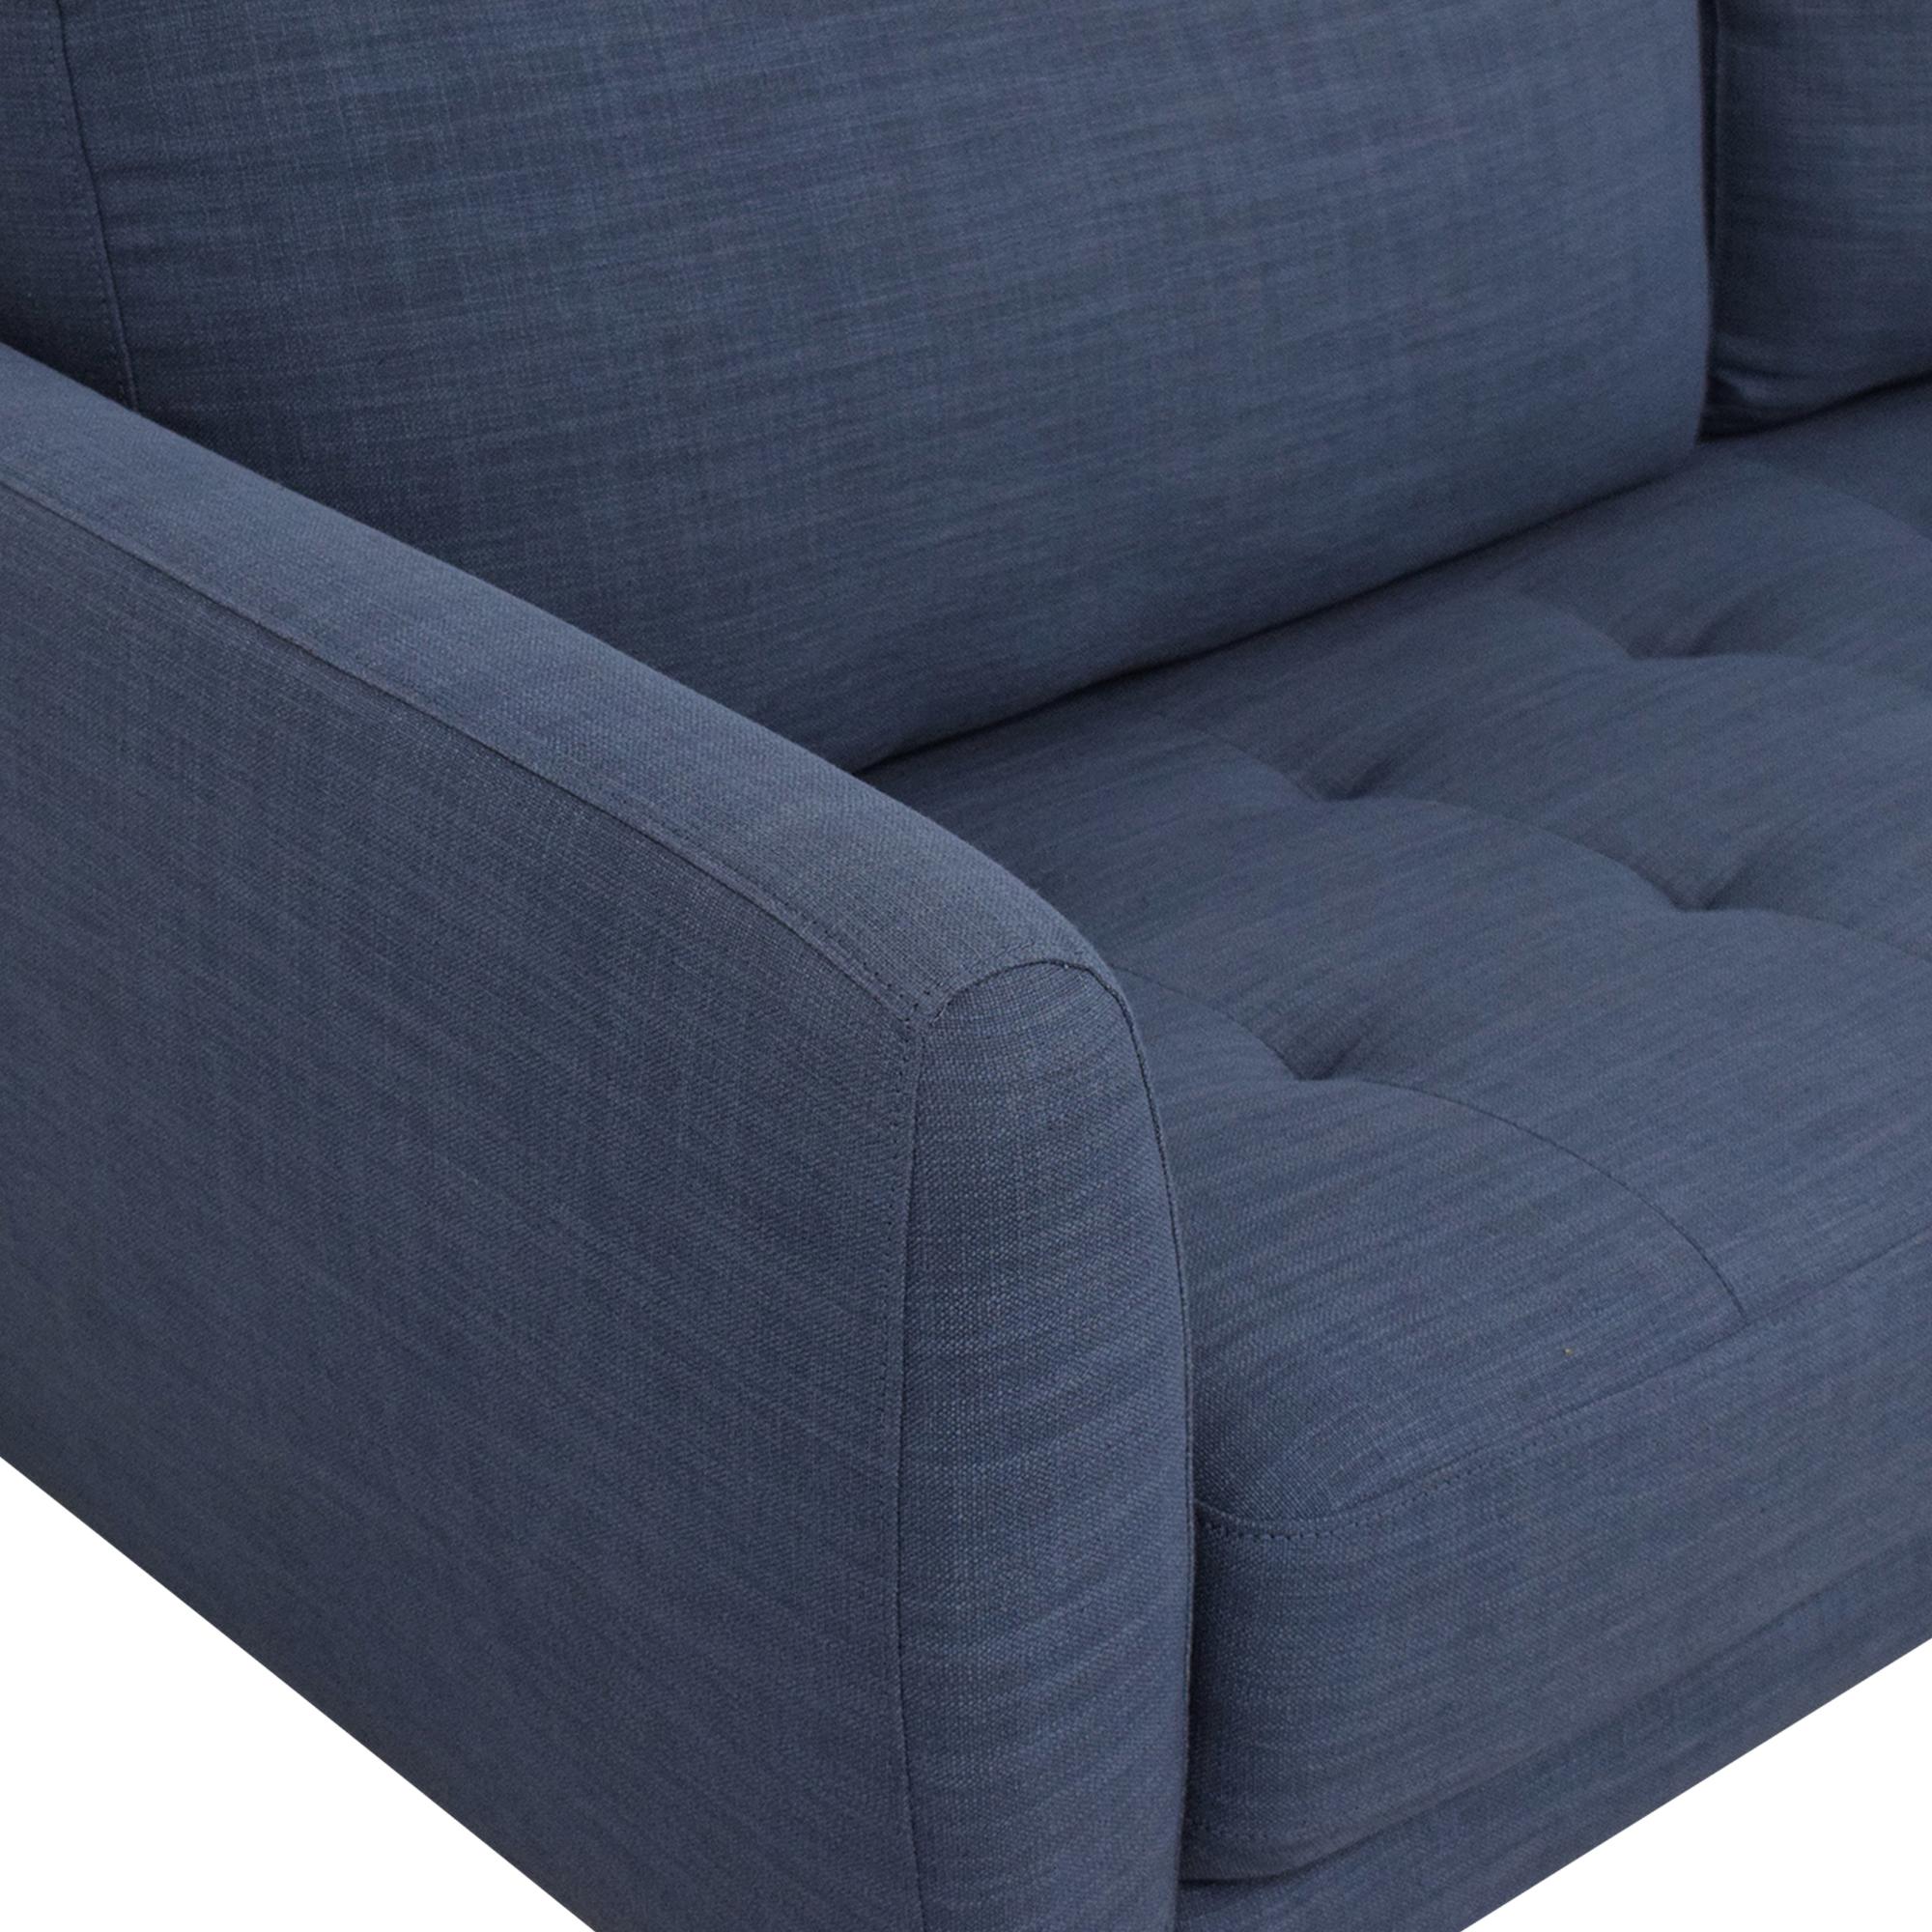 Macy's Macy's Nilah Sofa used